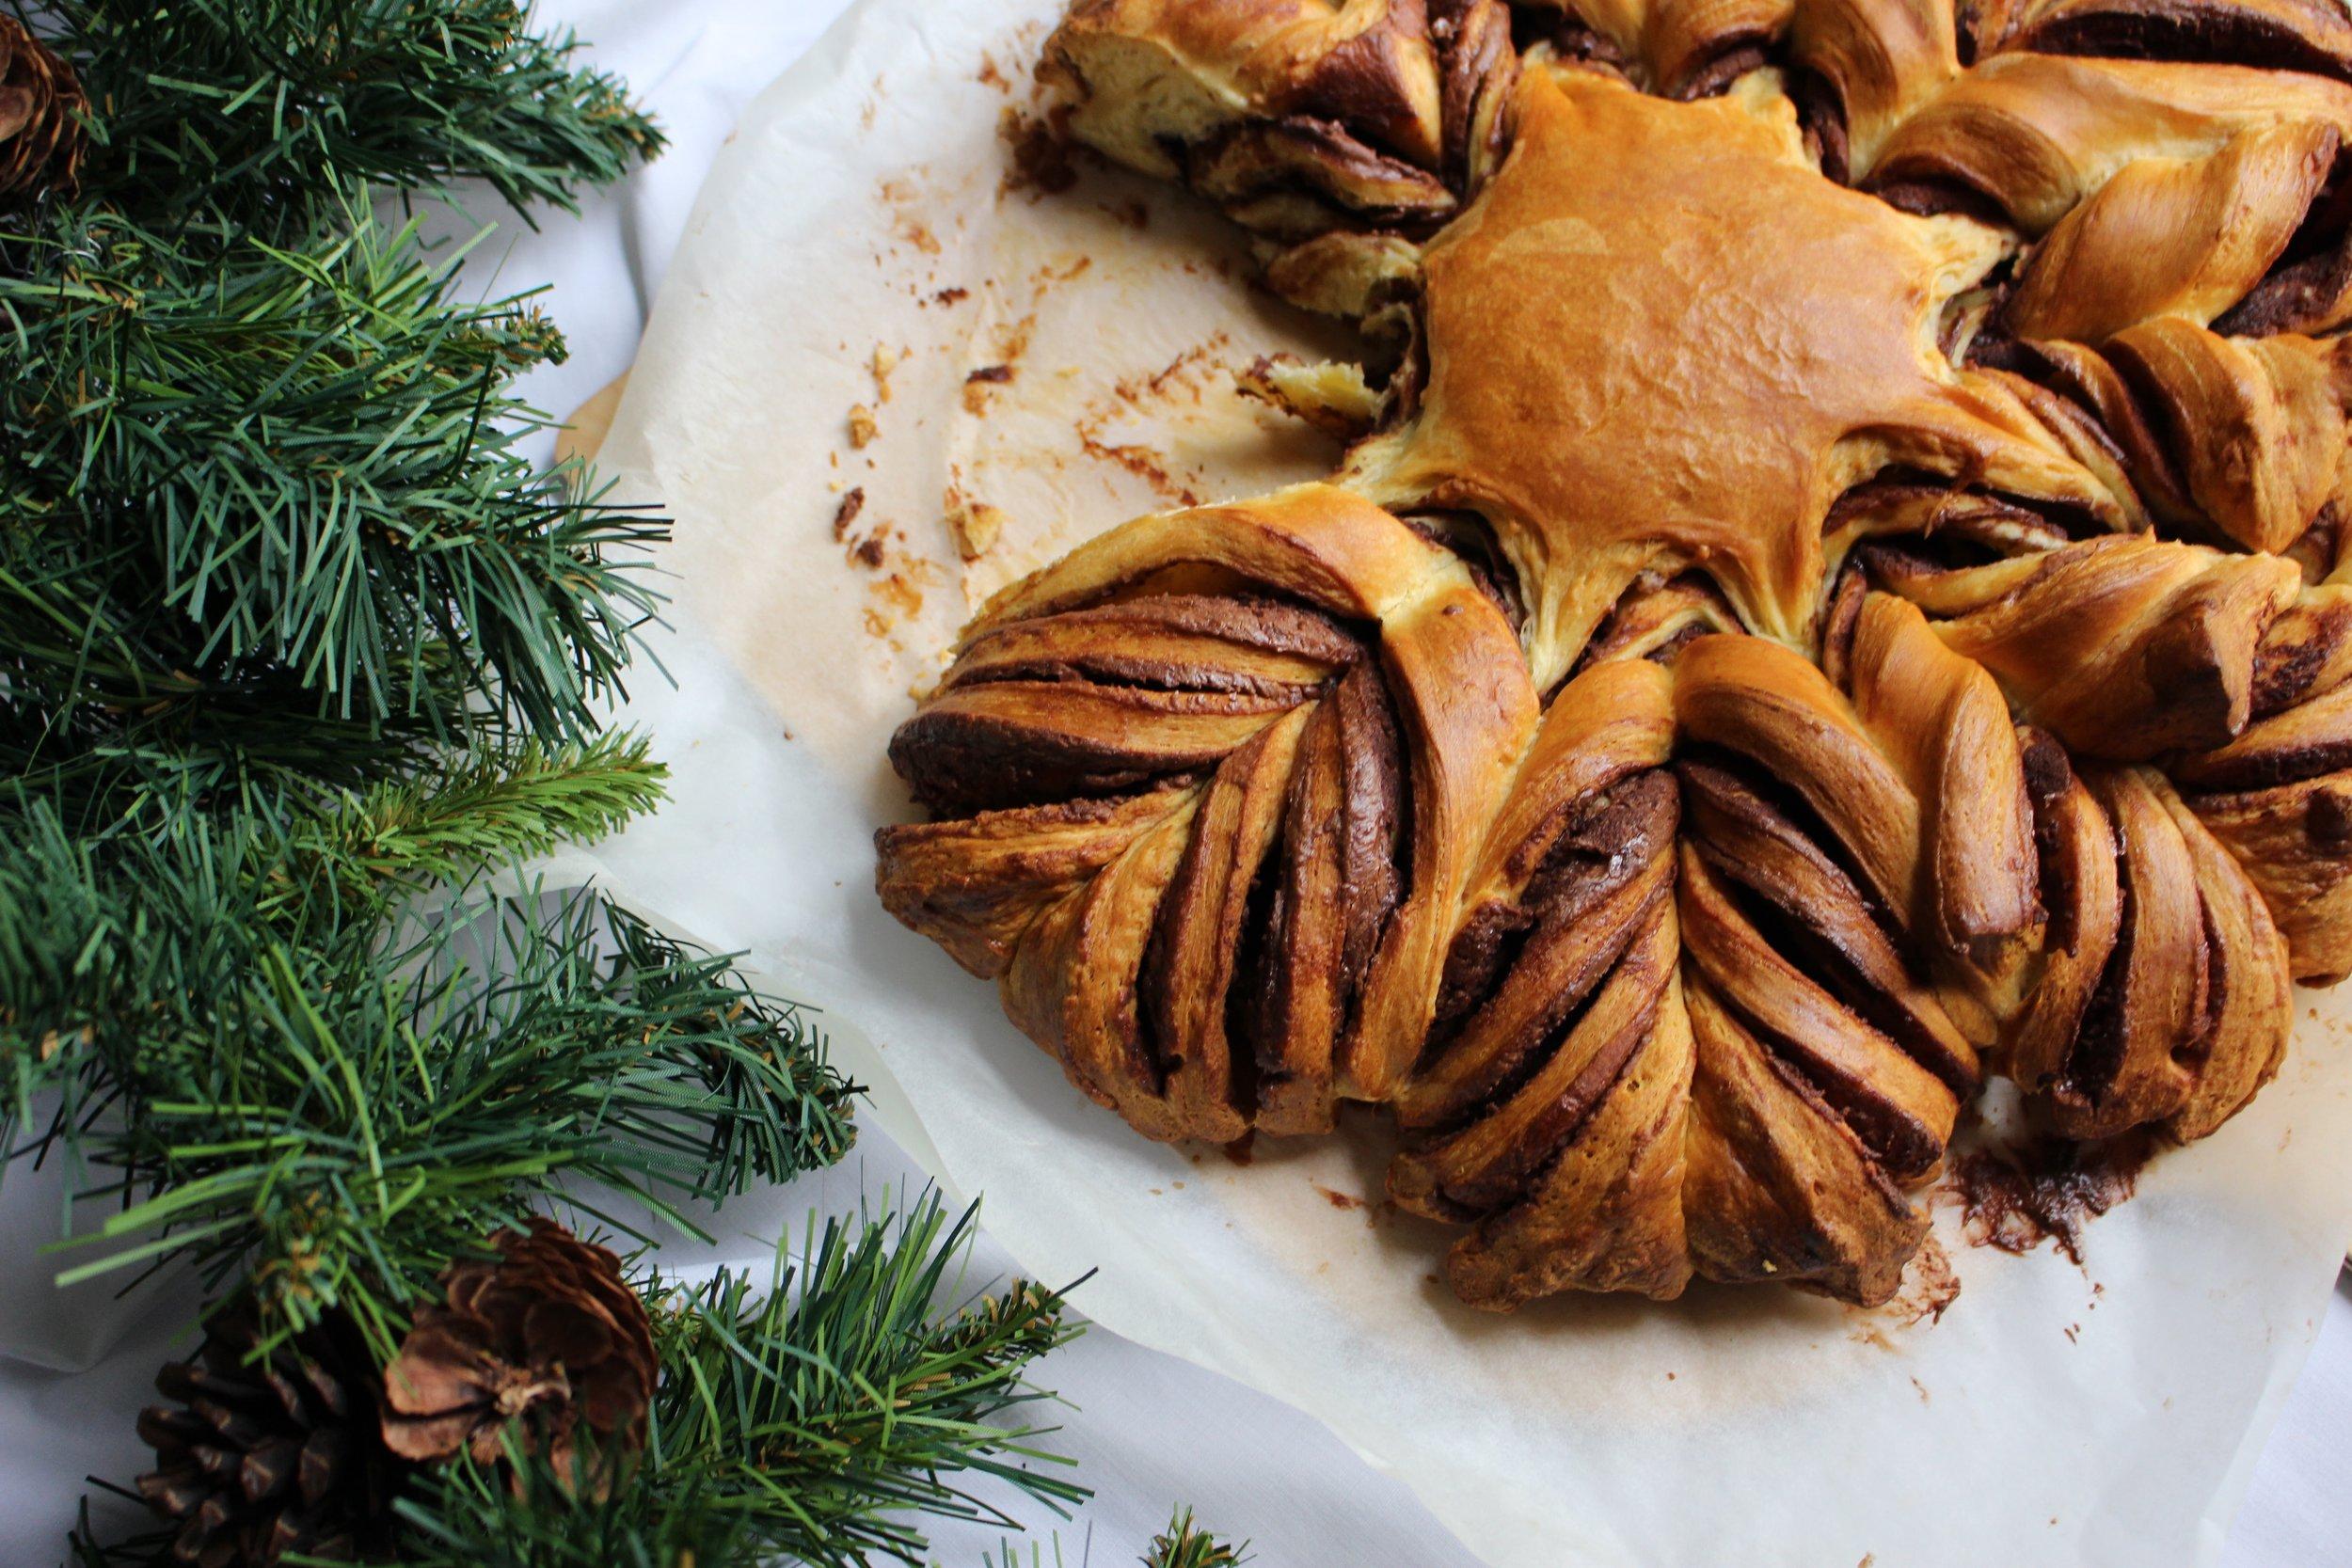 Chocolate share and tear snowflake tart